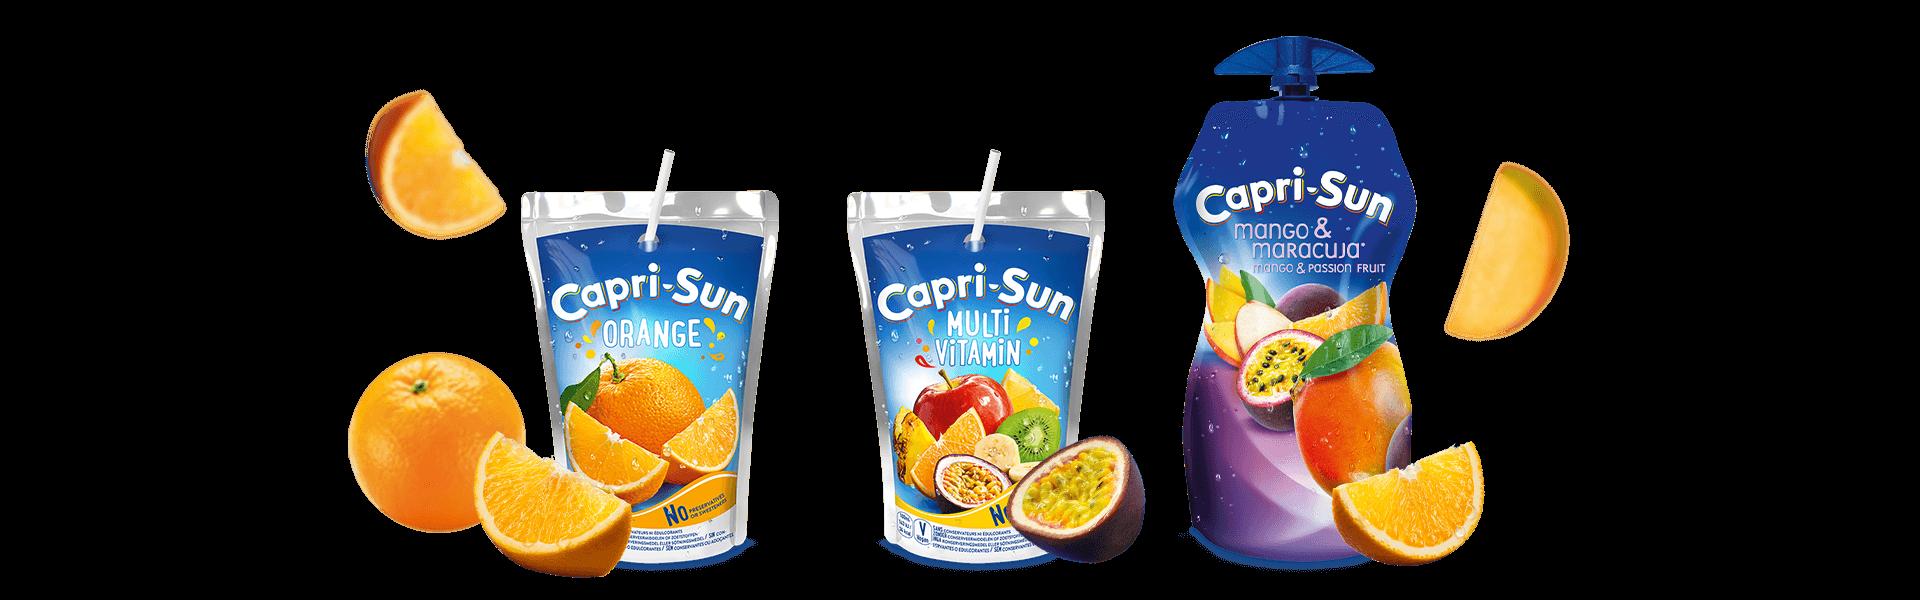 Capri-Sun_Orange_200ml_Multivitamin_200ml_and_Mango-Maracuja_330ml_with-flying-fruits_picture-1024x320_v2